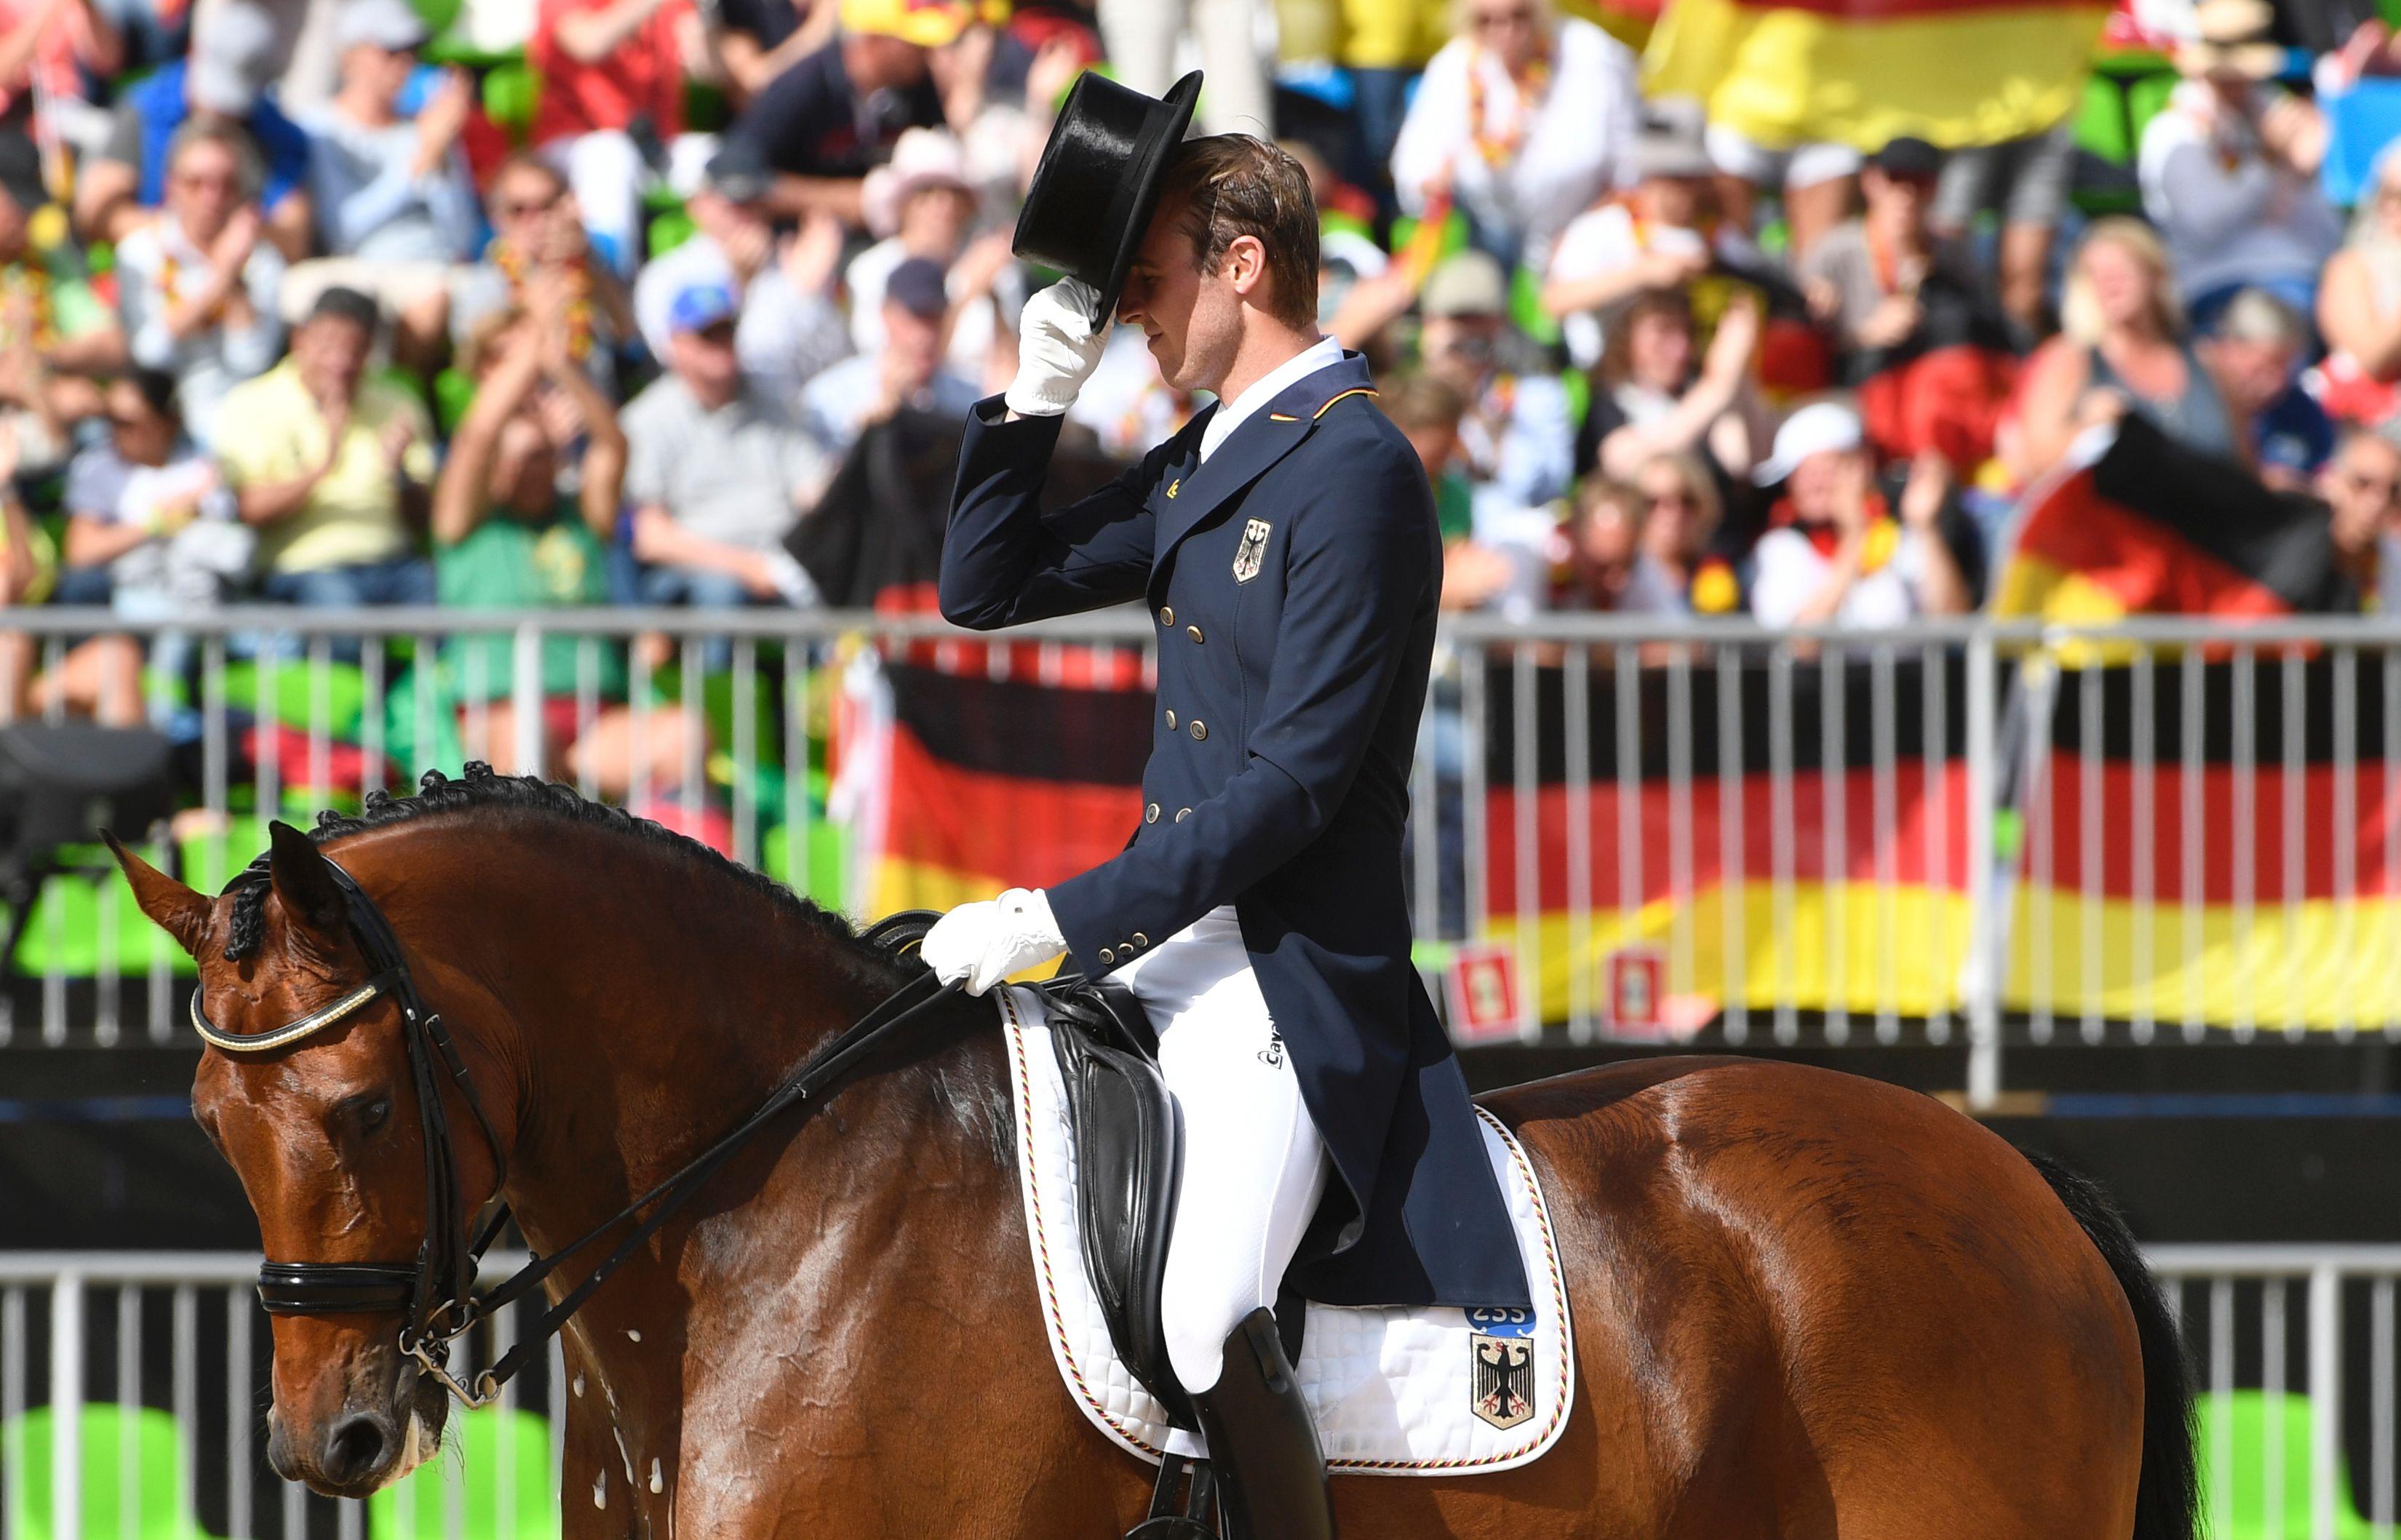 Olympics, equestrian, dressage, live stream